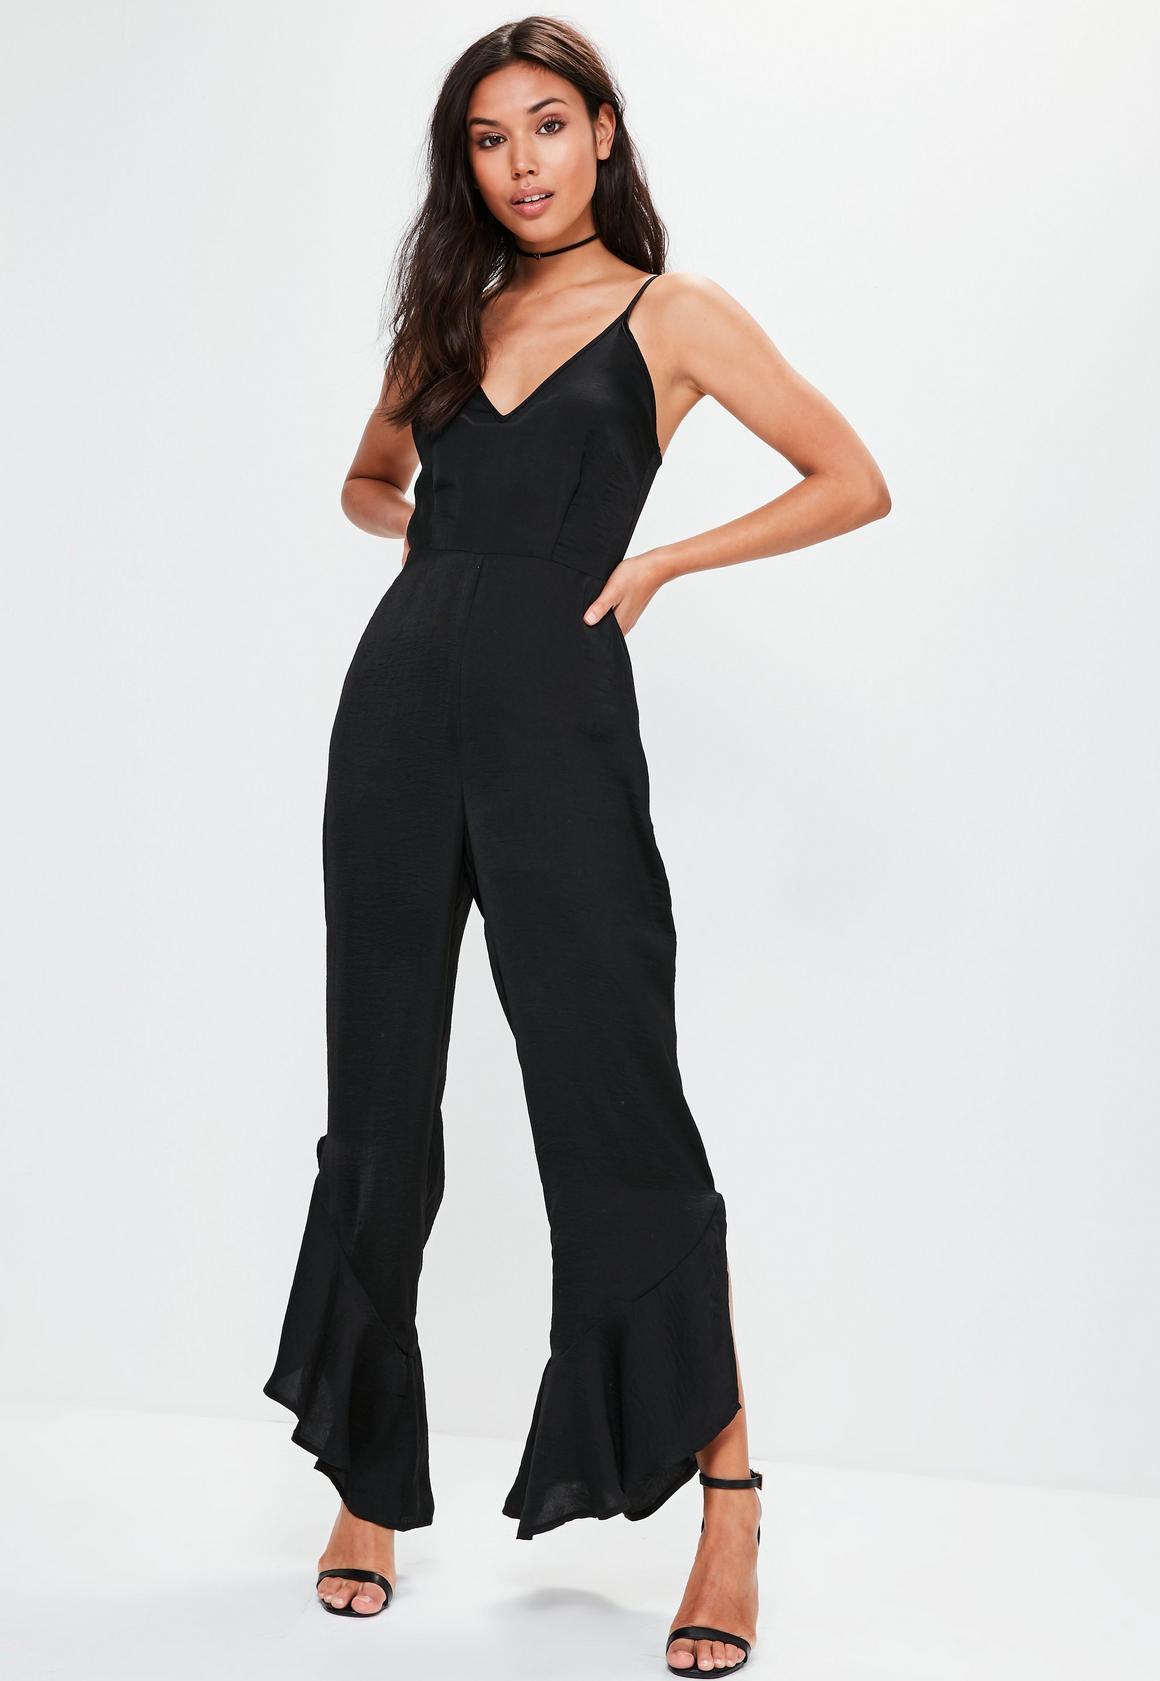 Petite Jumpsuit, Womens Petite Jumpsuits | Missguided